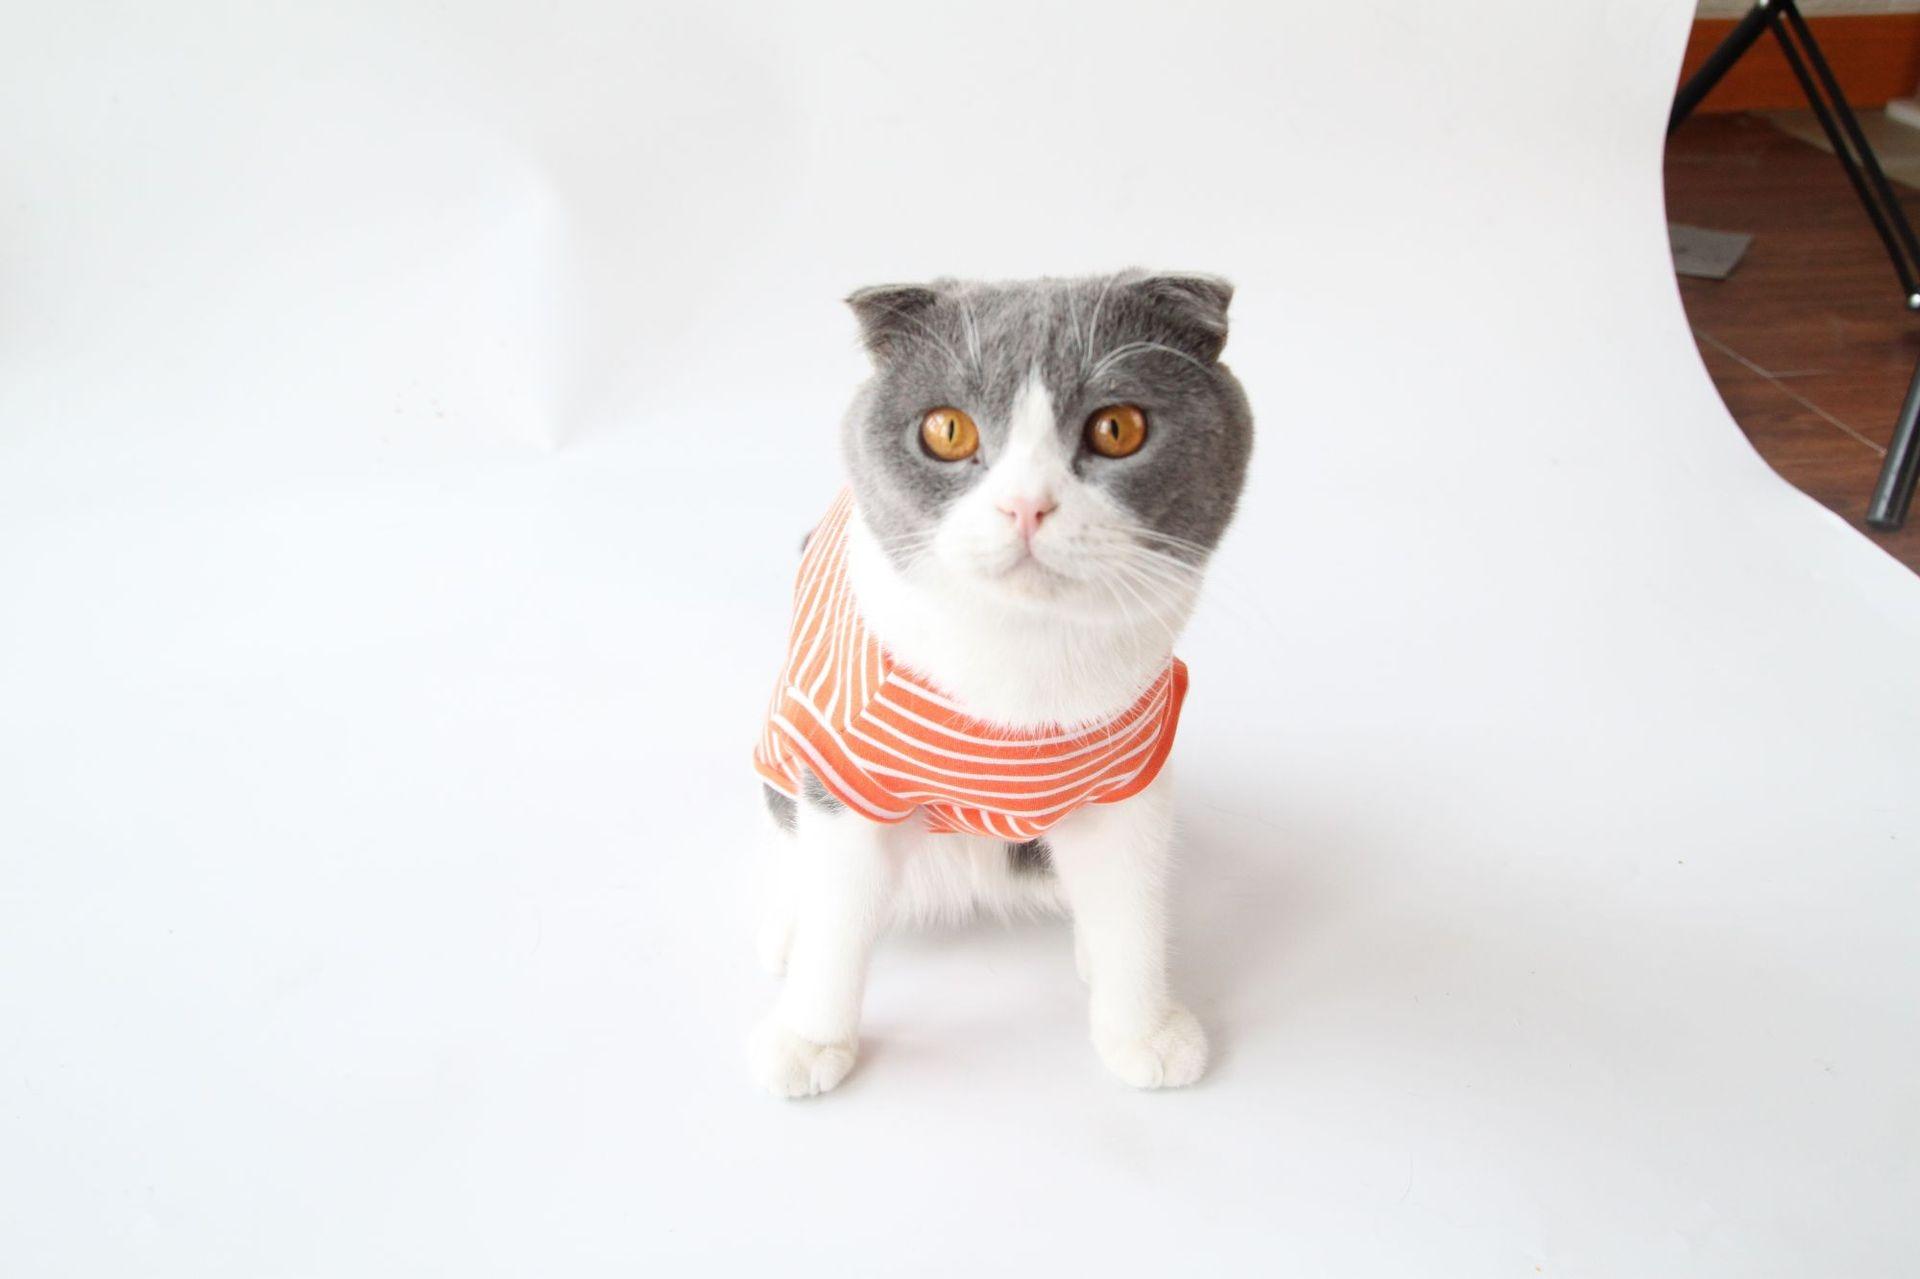 Algodón Gato Mascota Ropa Suave Moda SpringAutumn Compre Nueva Traje n0wP8OkX